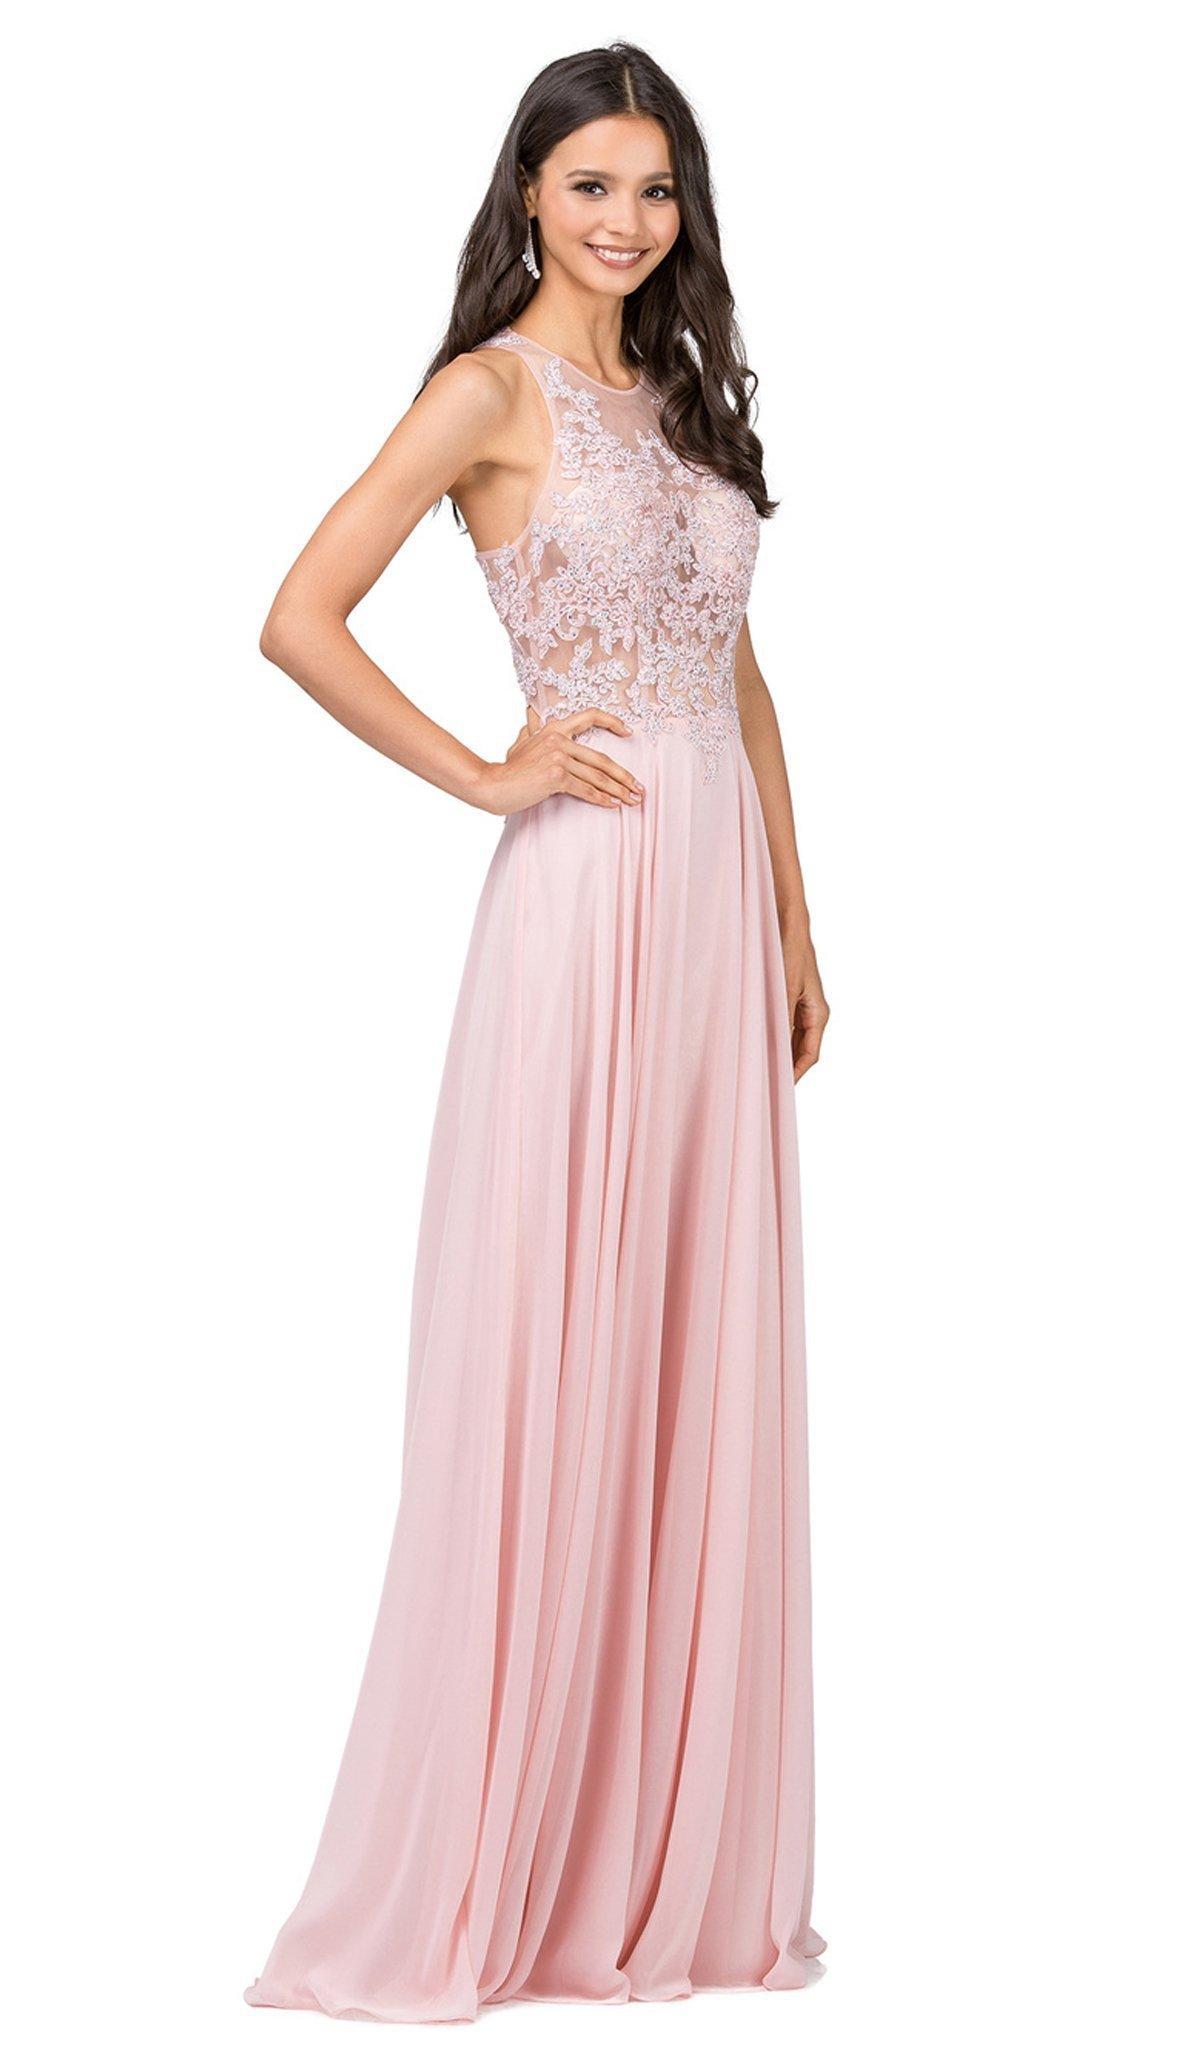 Dancing Queen - 2251 Lace Sheer Halter A-line Prom Dress